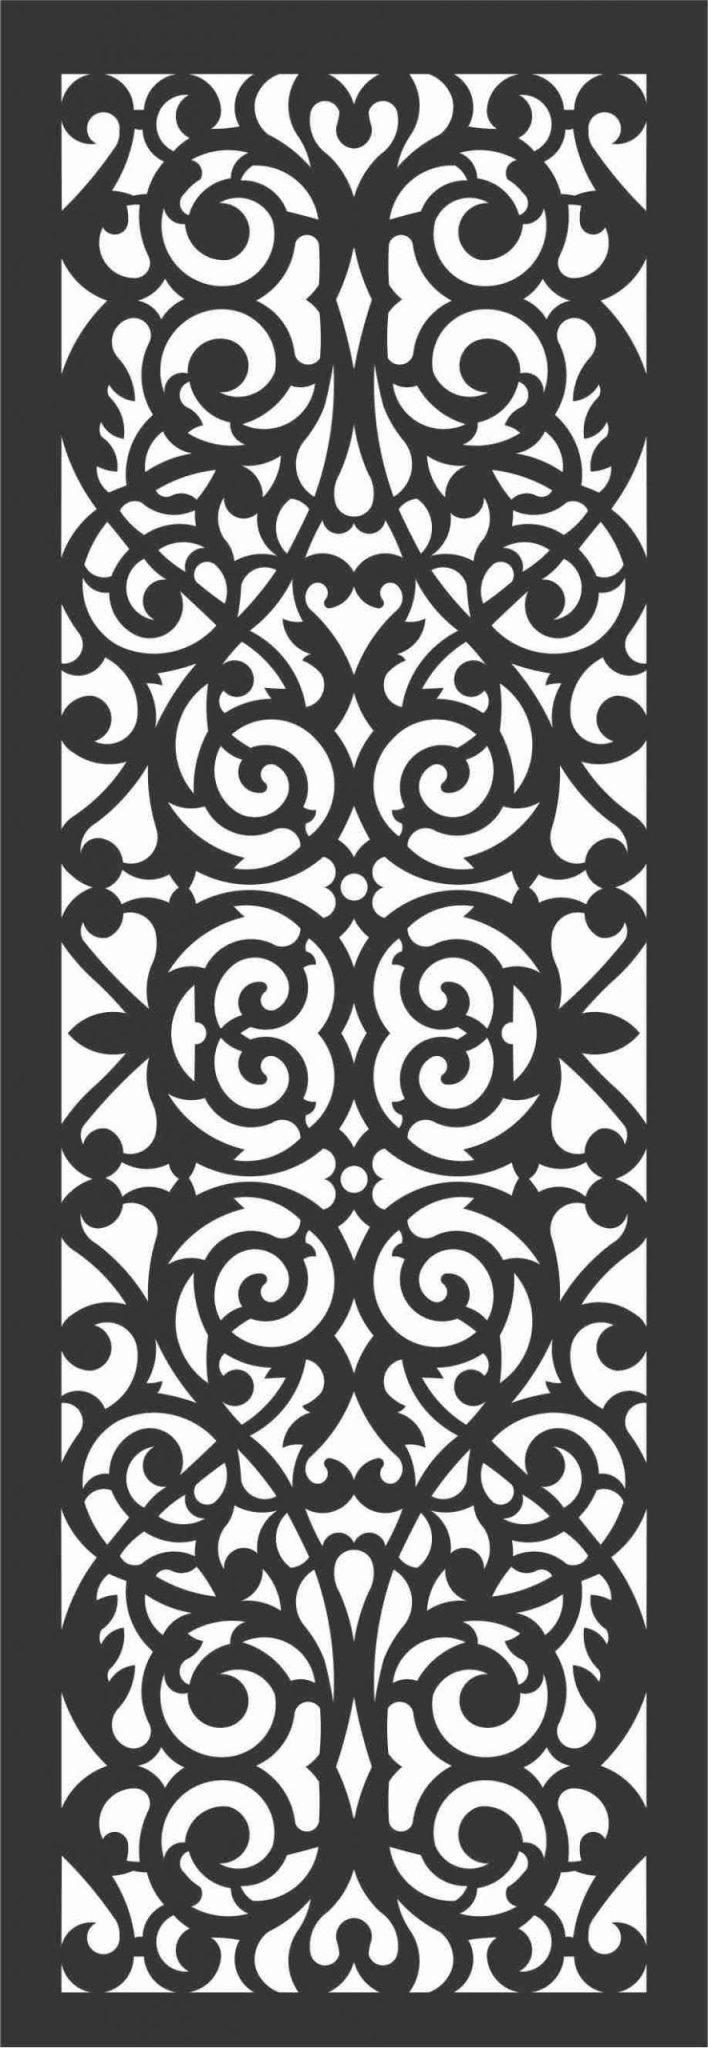 Screen Panel Patterns Seamless 52 Free DXF File